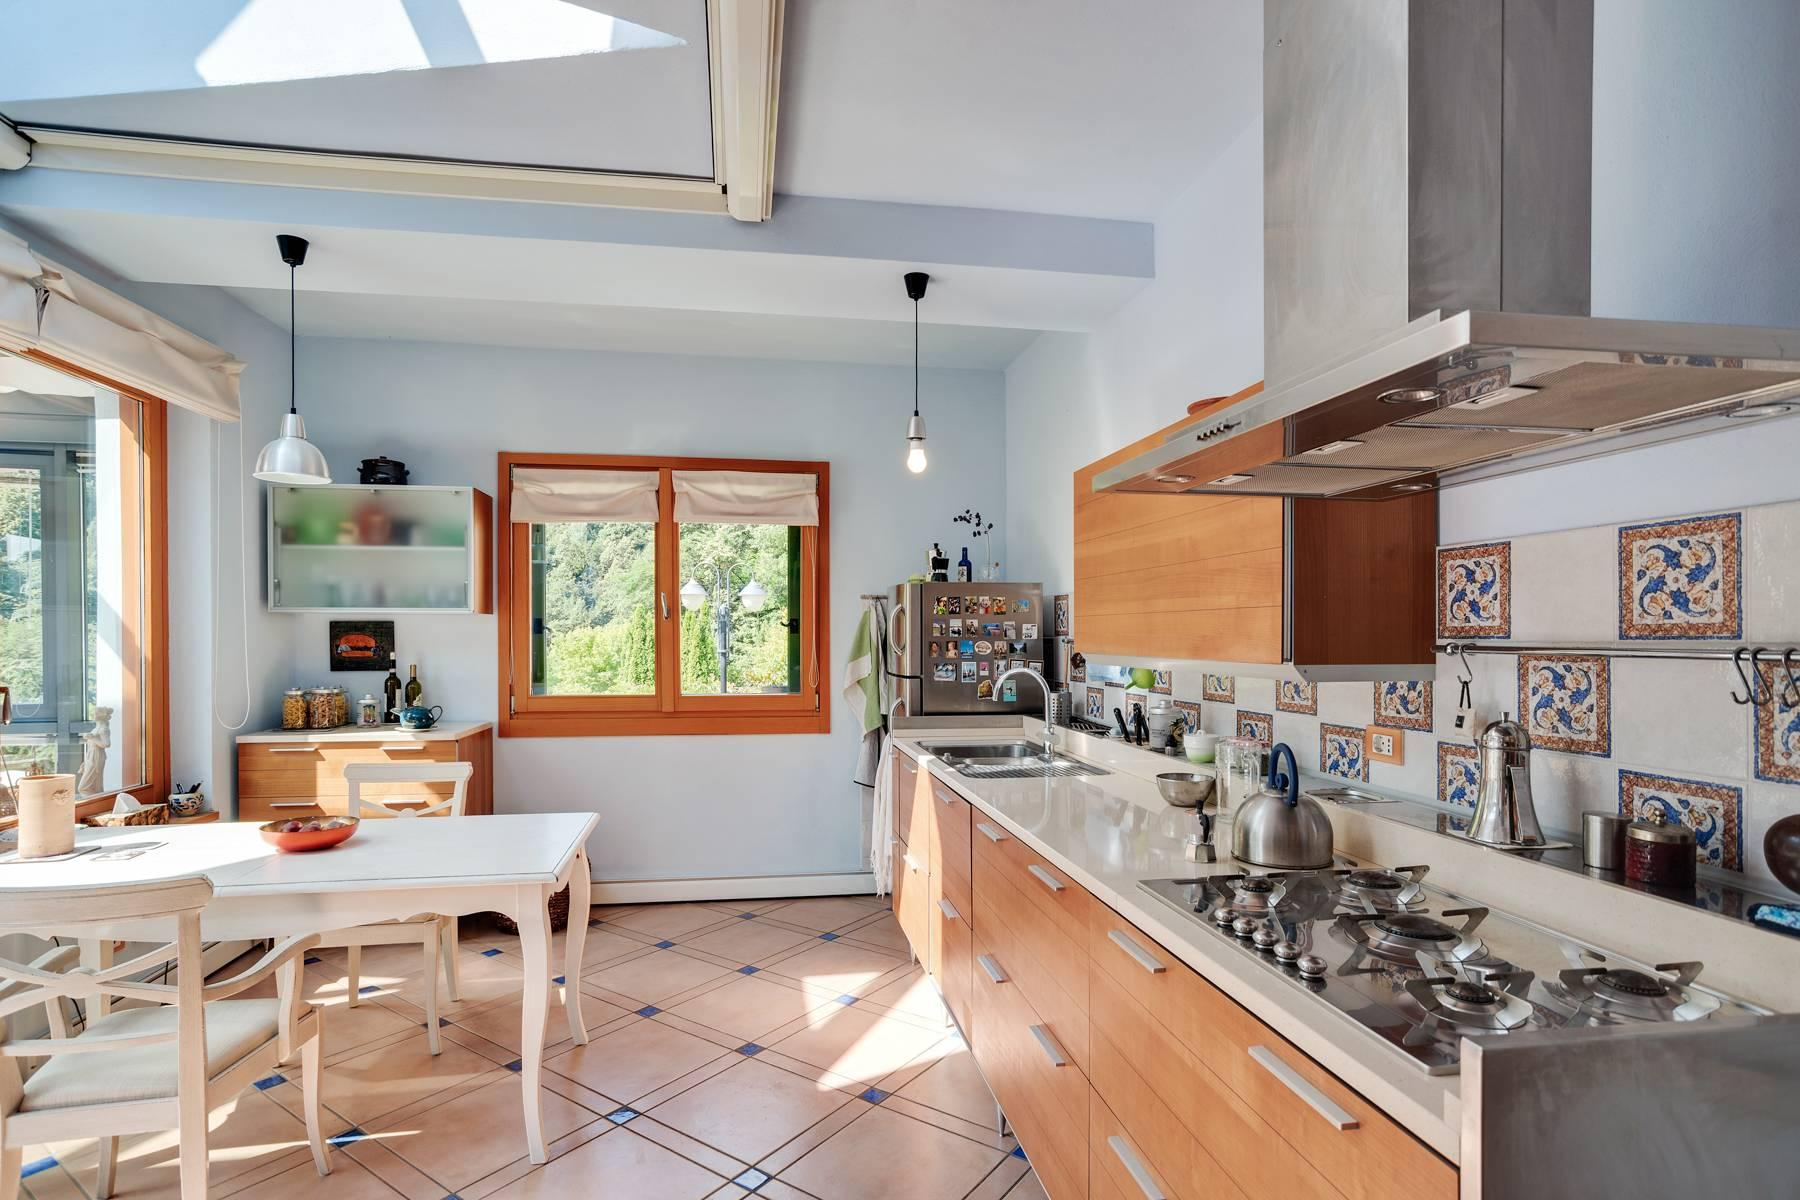 Splendida villa moderna sulla collina soleggiata sopra Argegno - 20